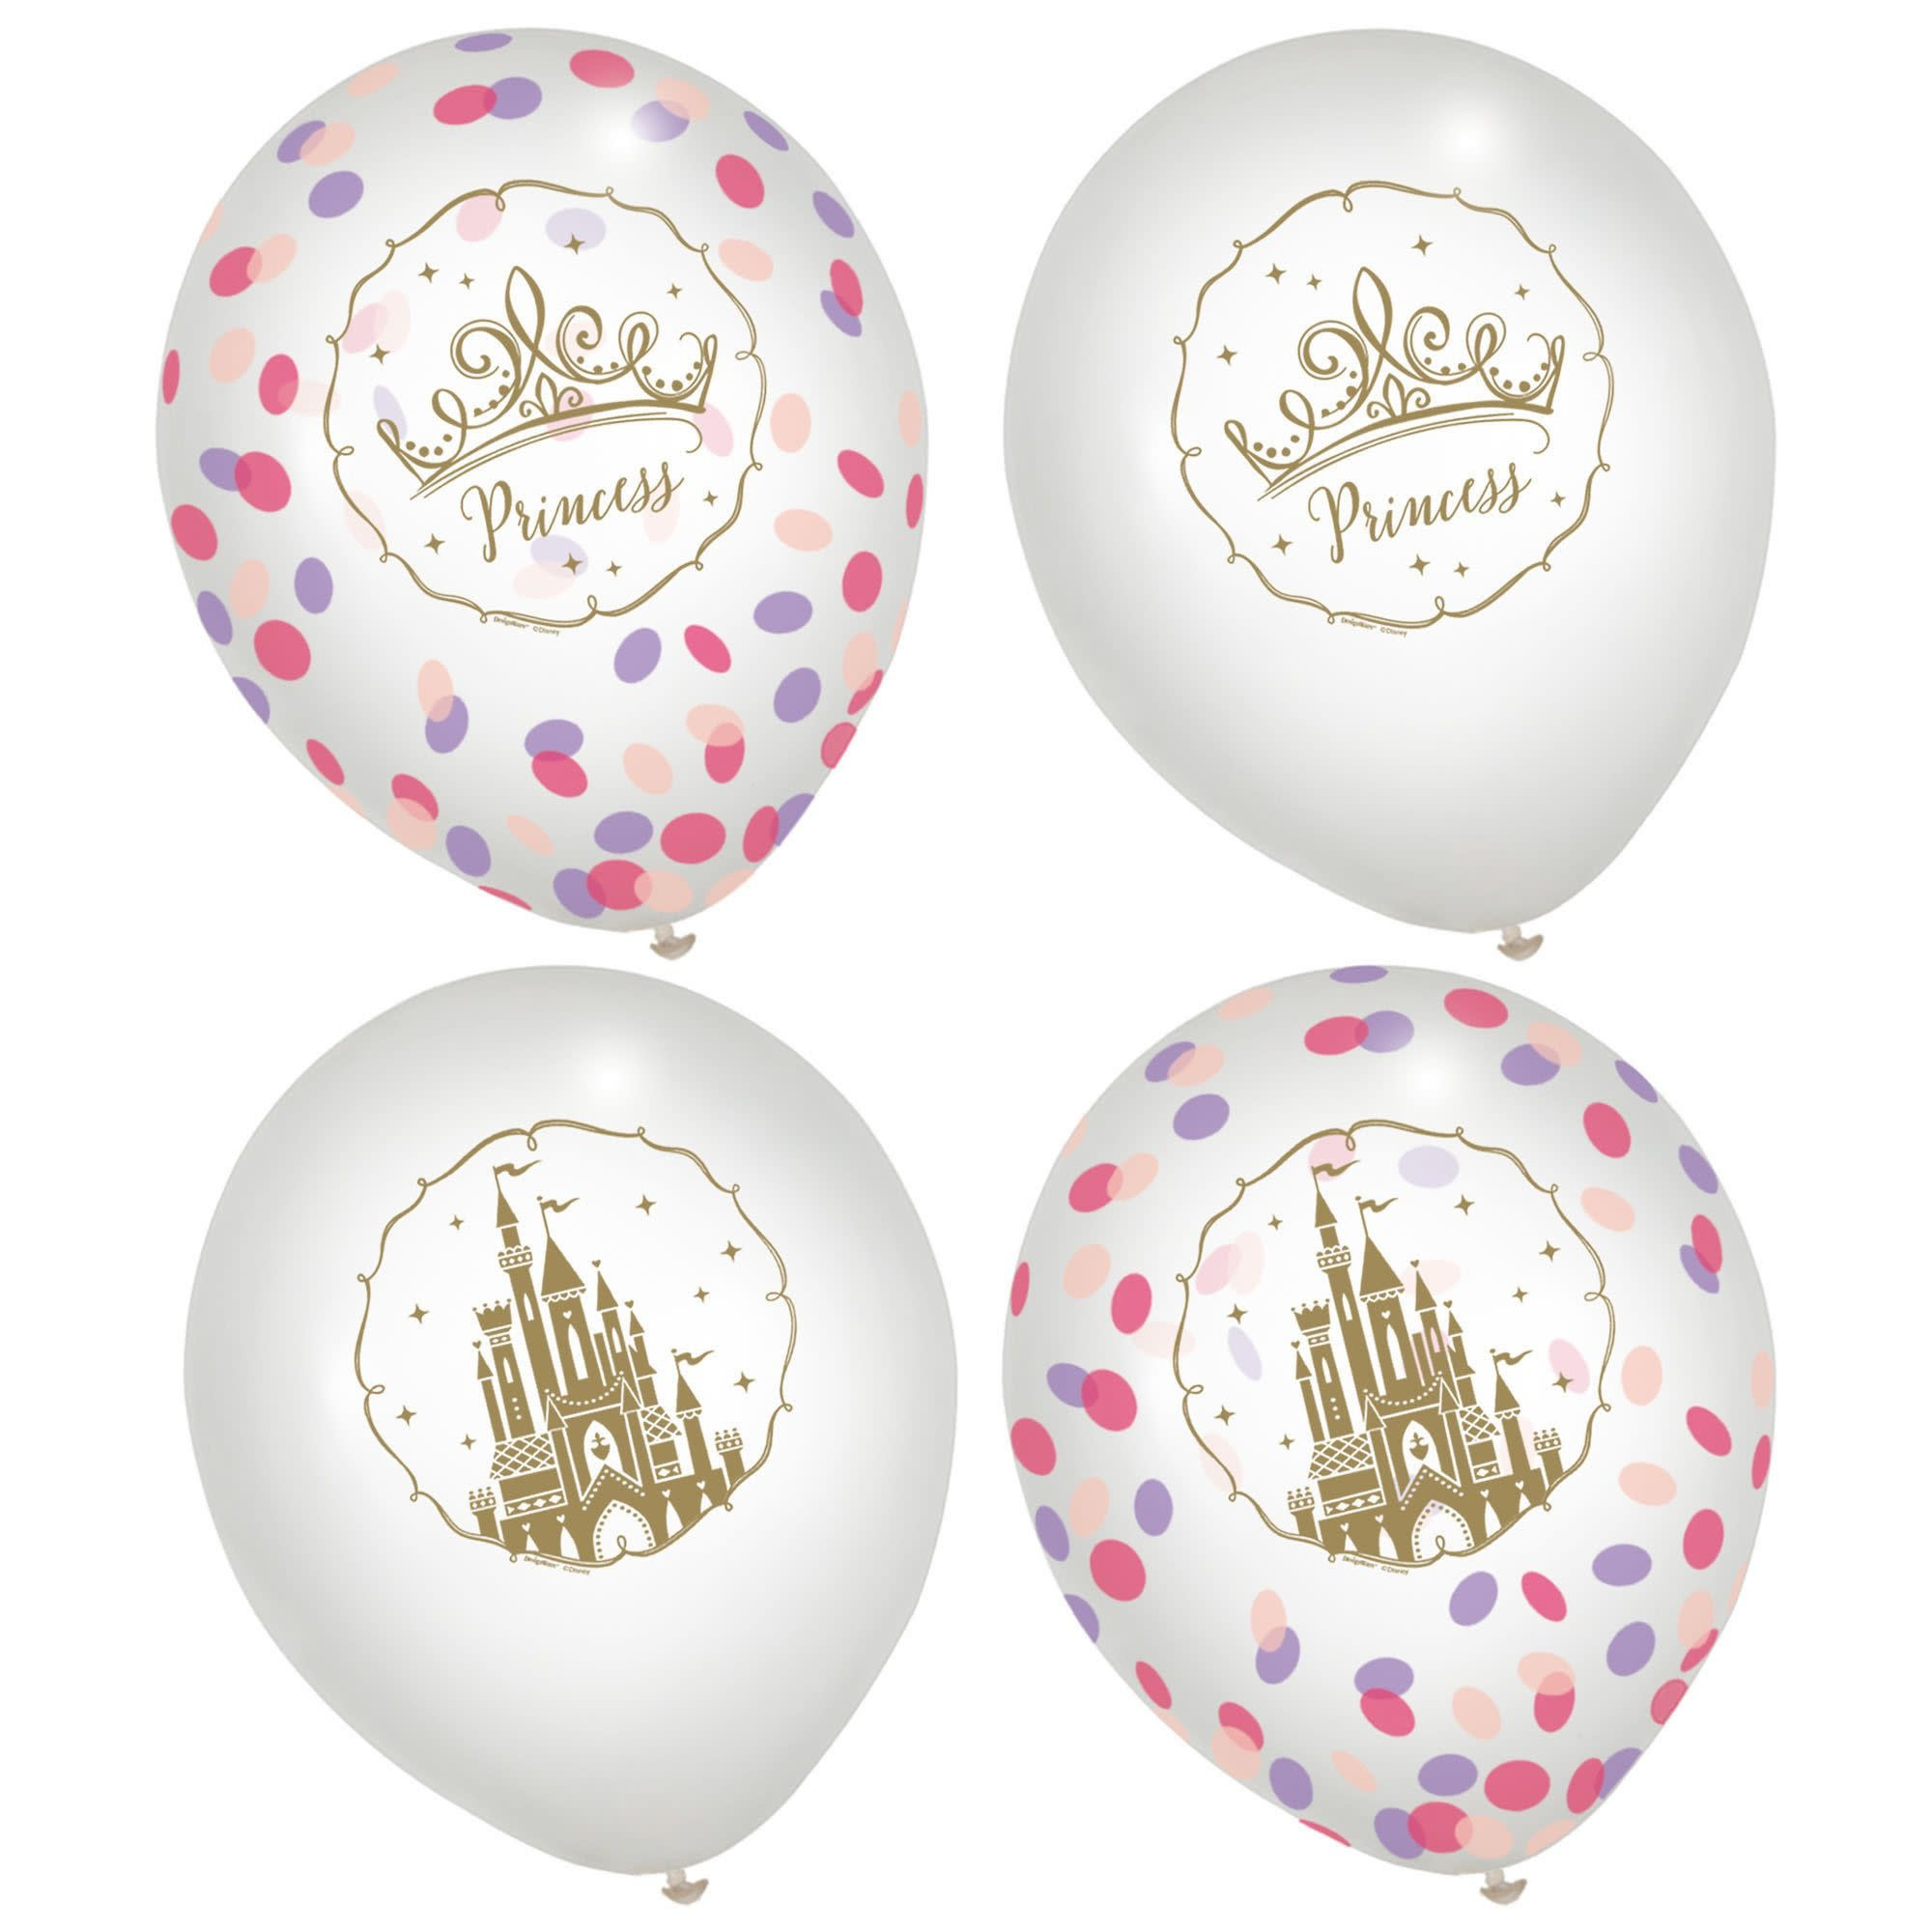 ©Disney Princess Latex Confetti Balloons (Latex Only)